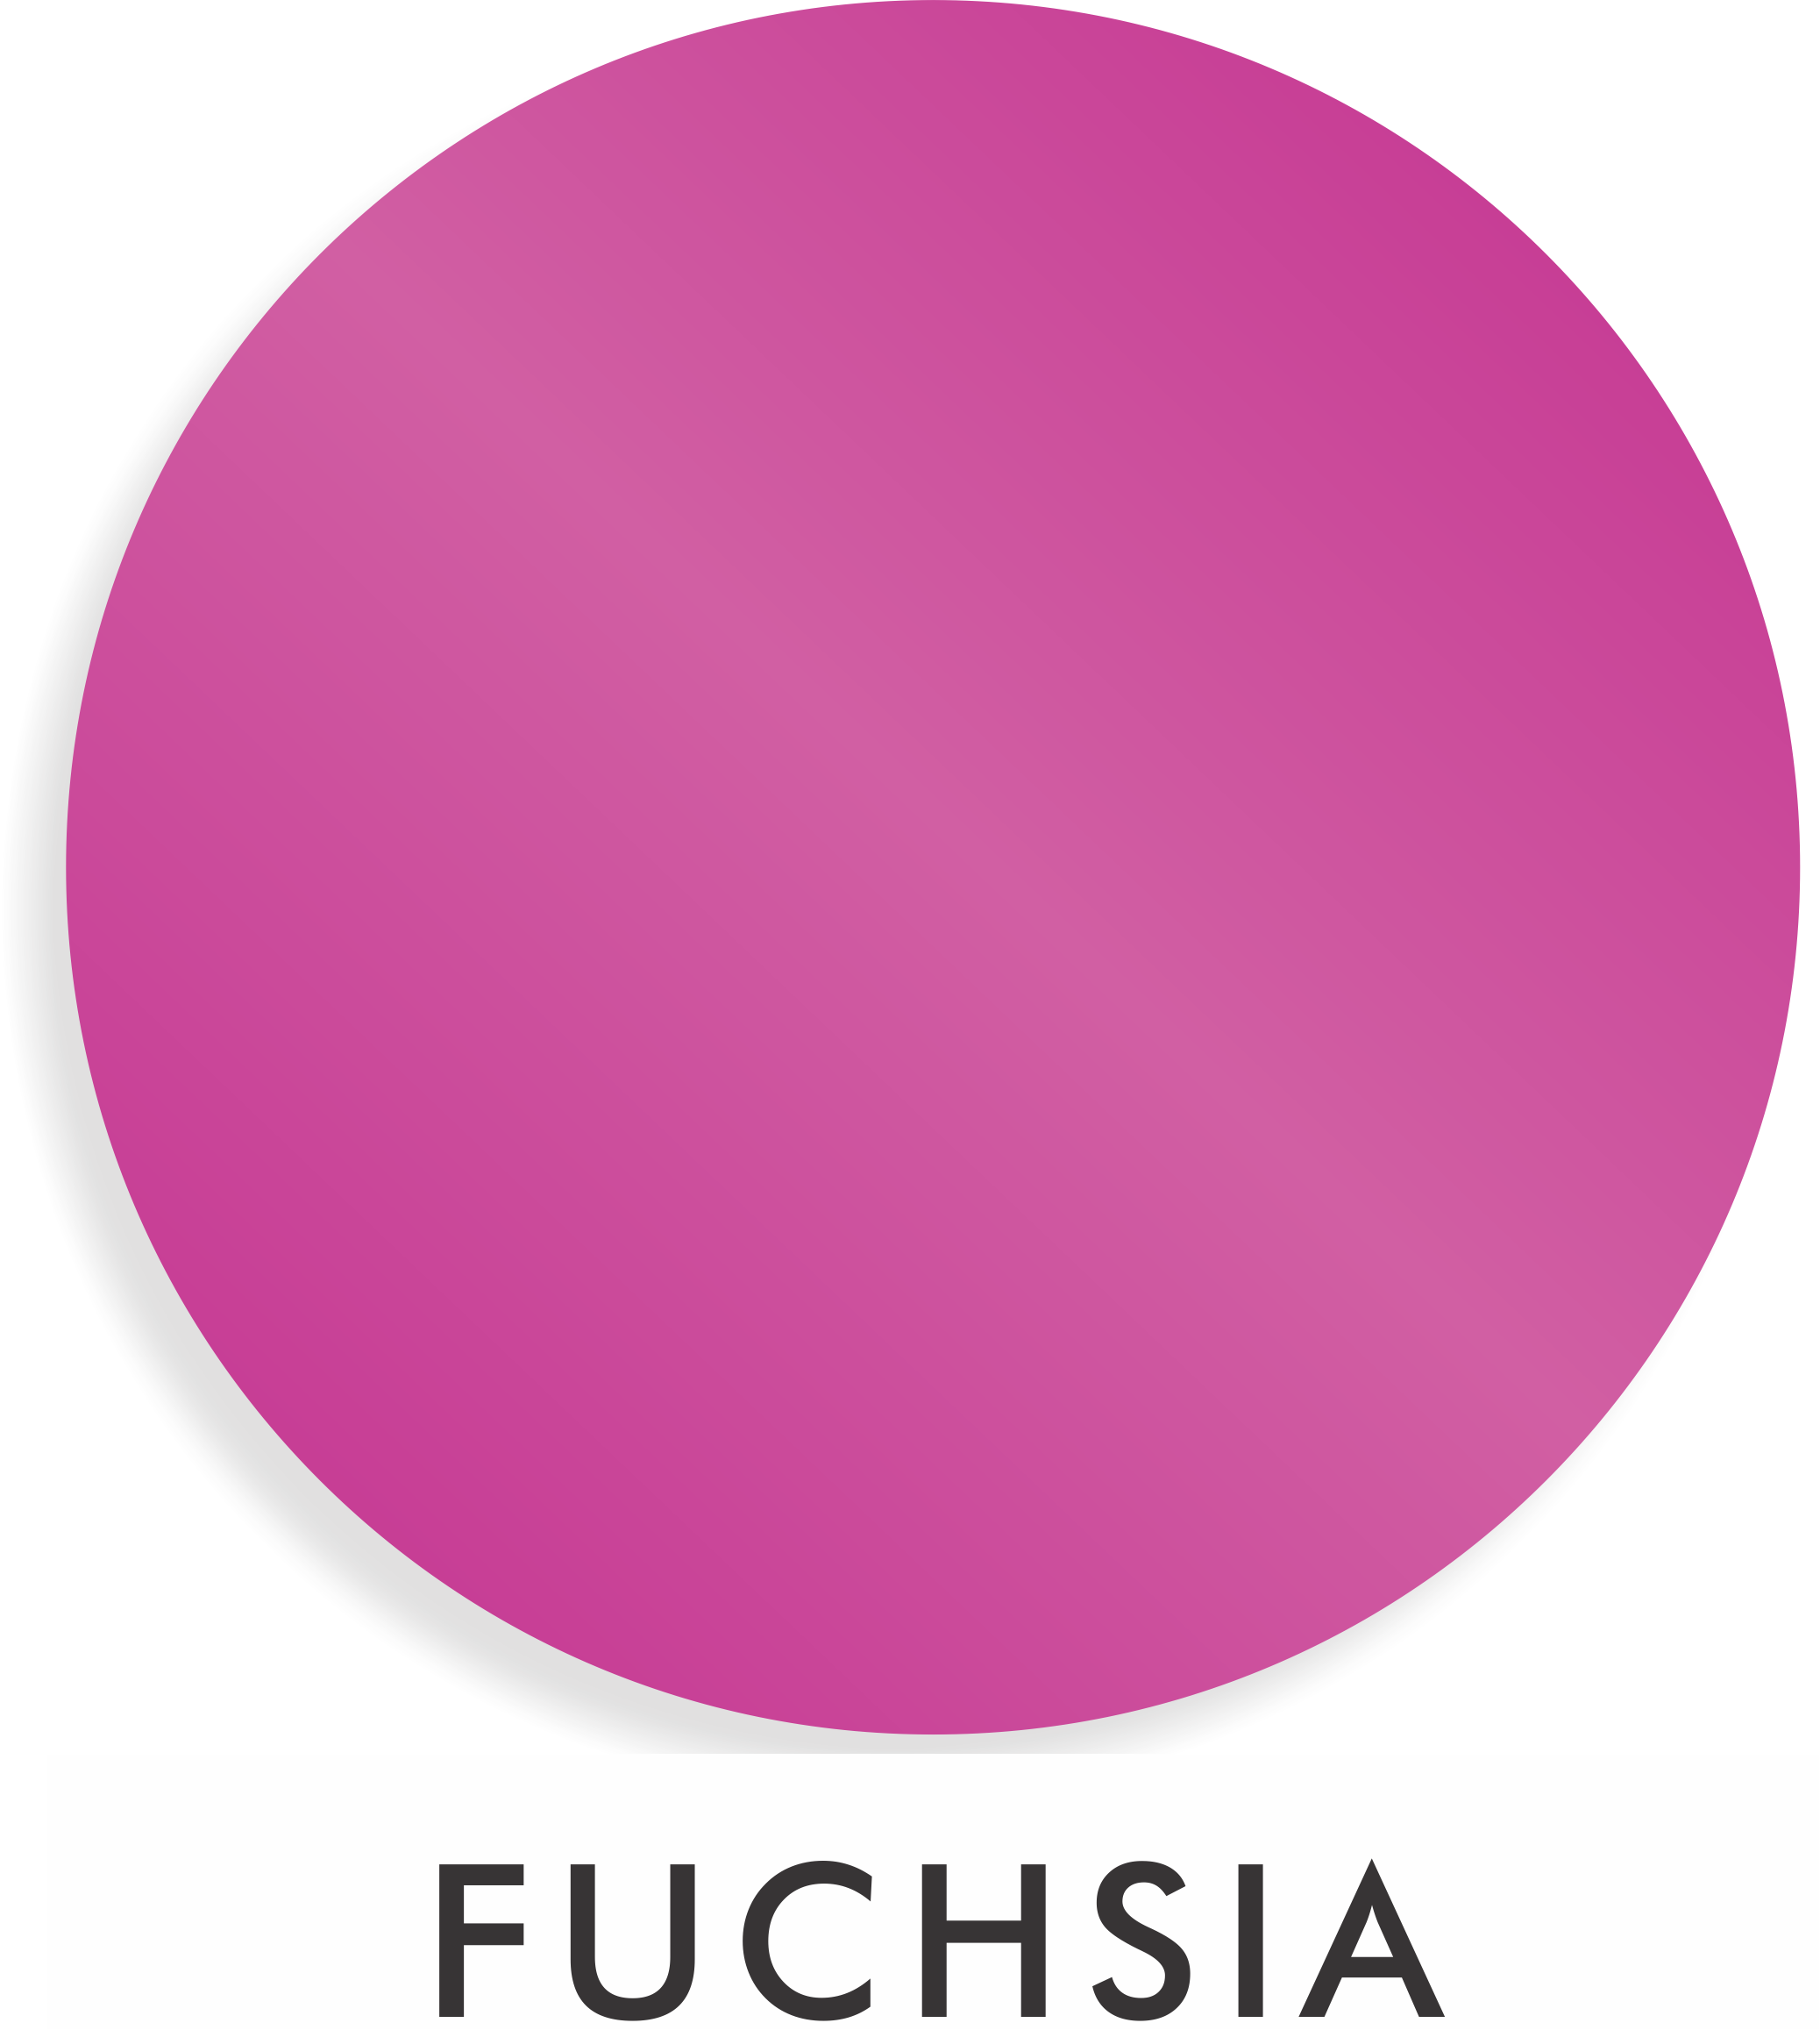 FUCHSIA FOIL.png